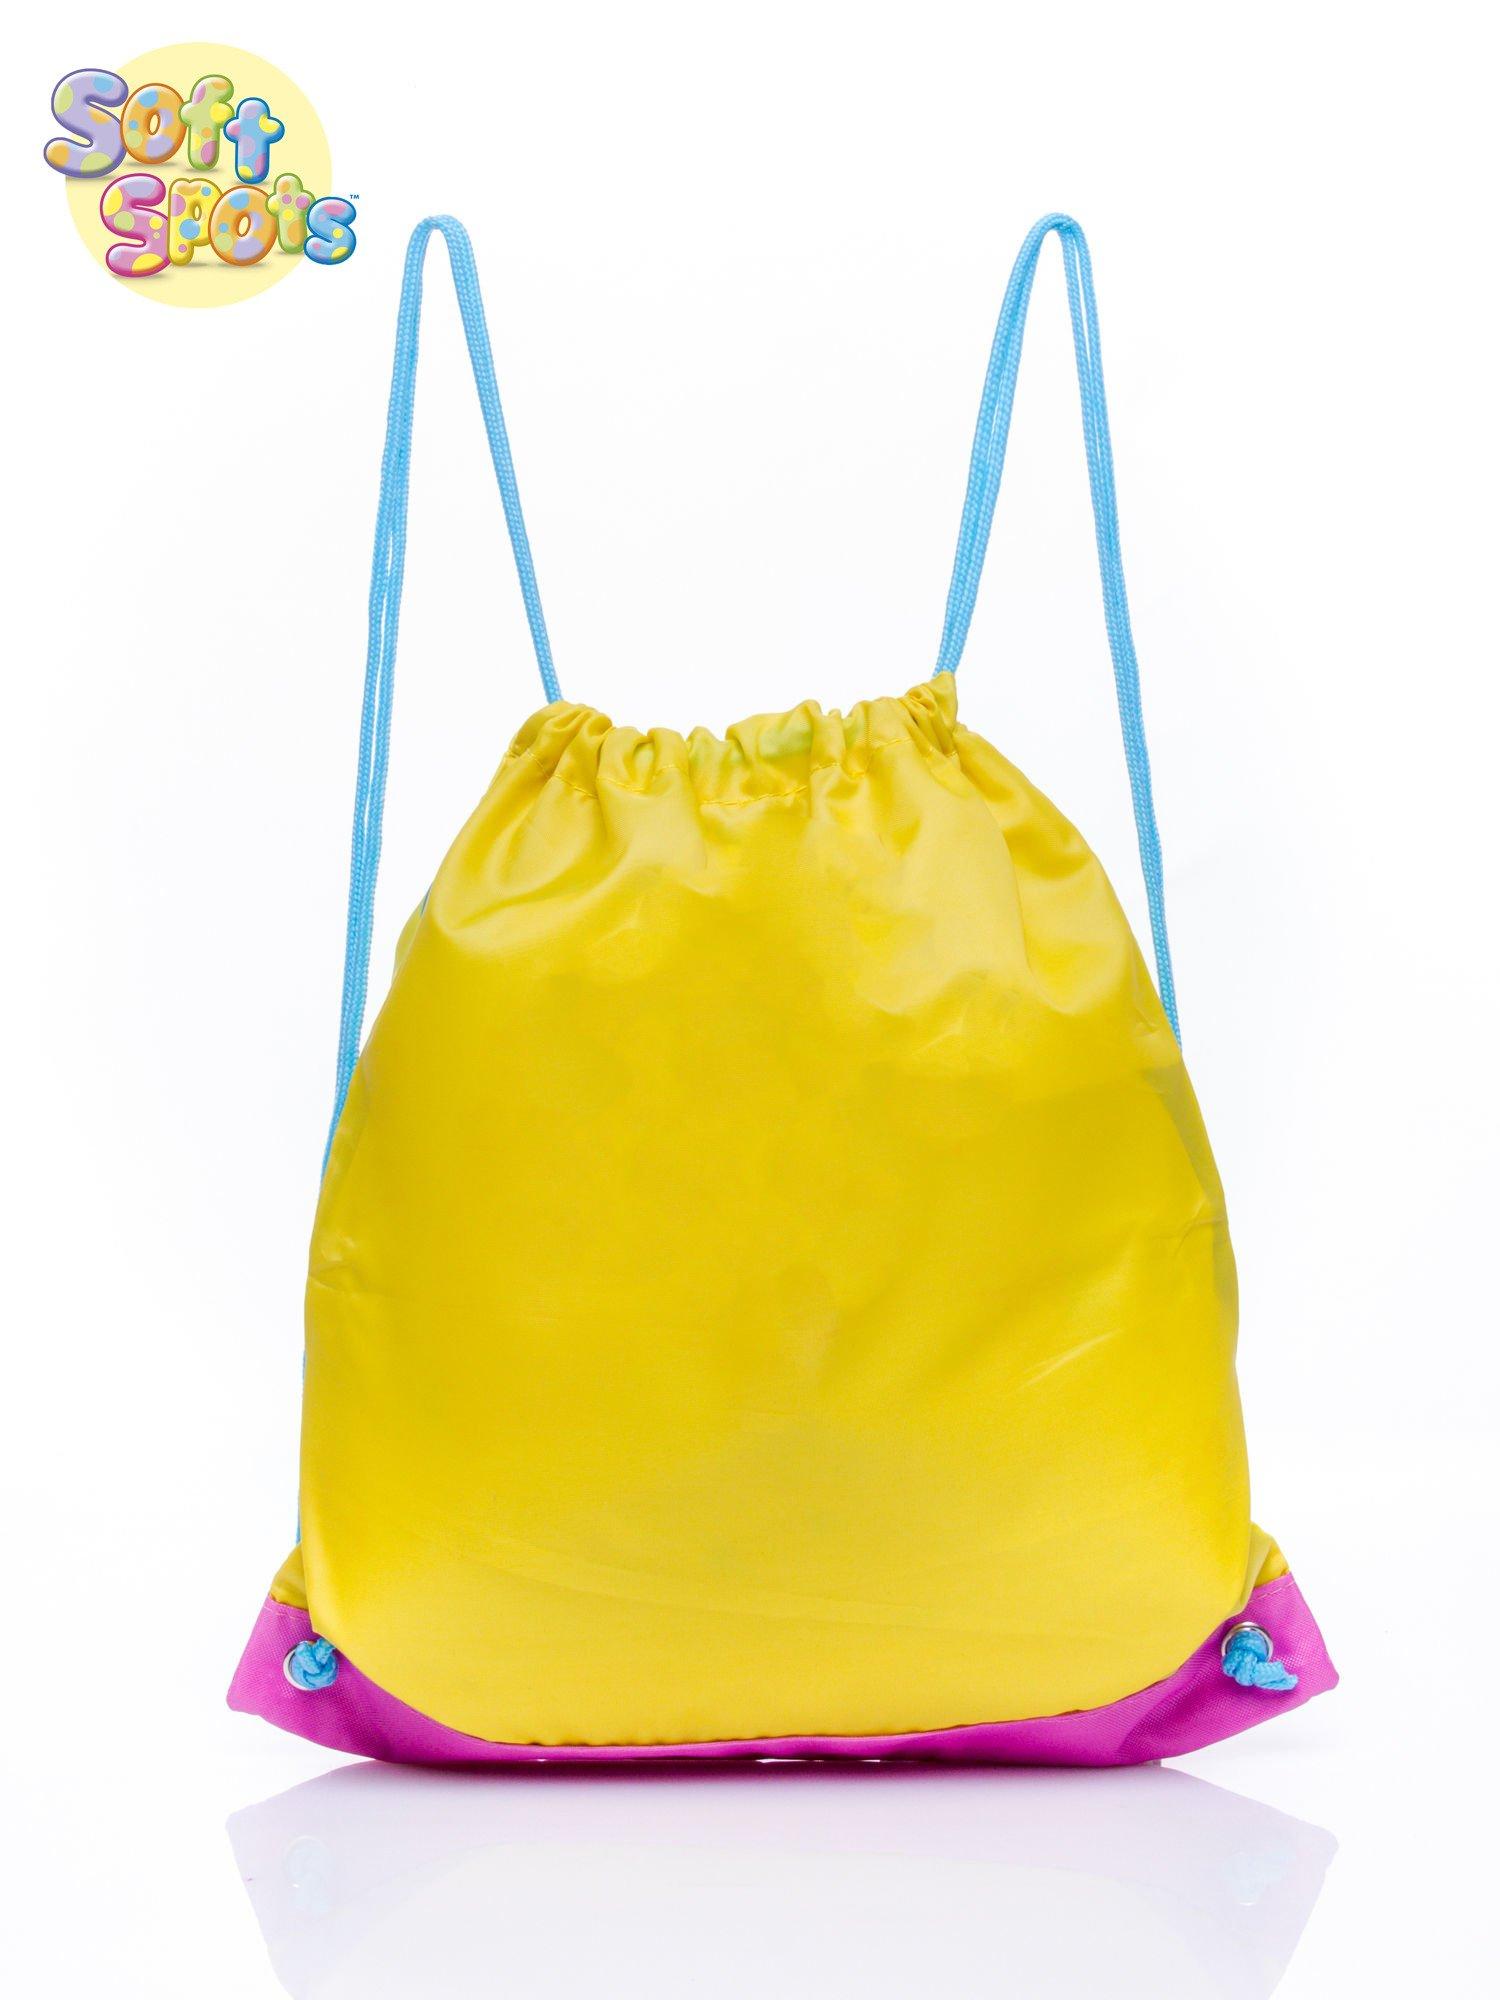 Żółty plecak worek DISNEY Soft Spots                                  zdj.                                  2